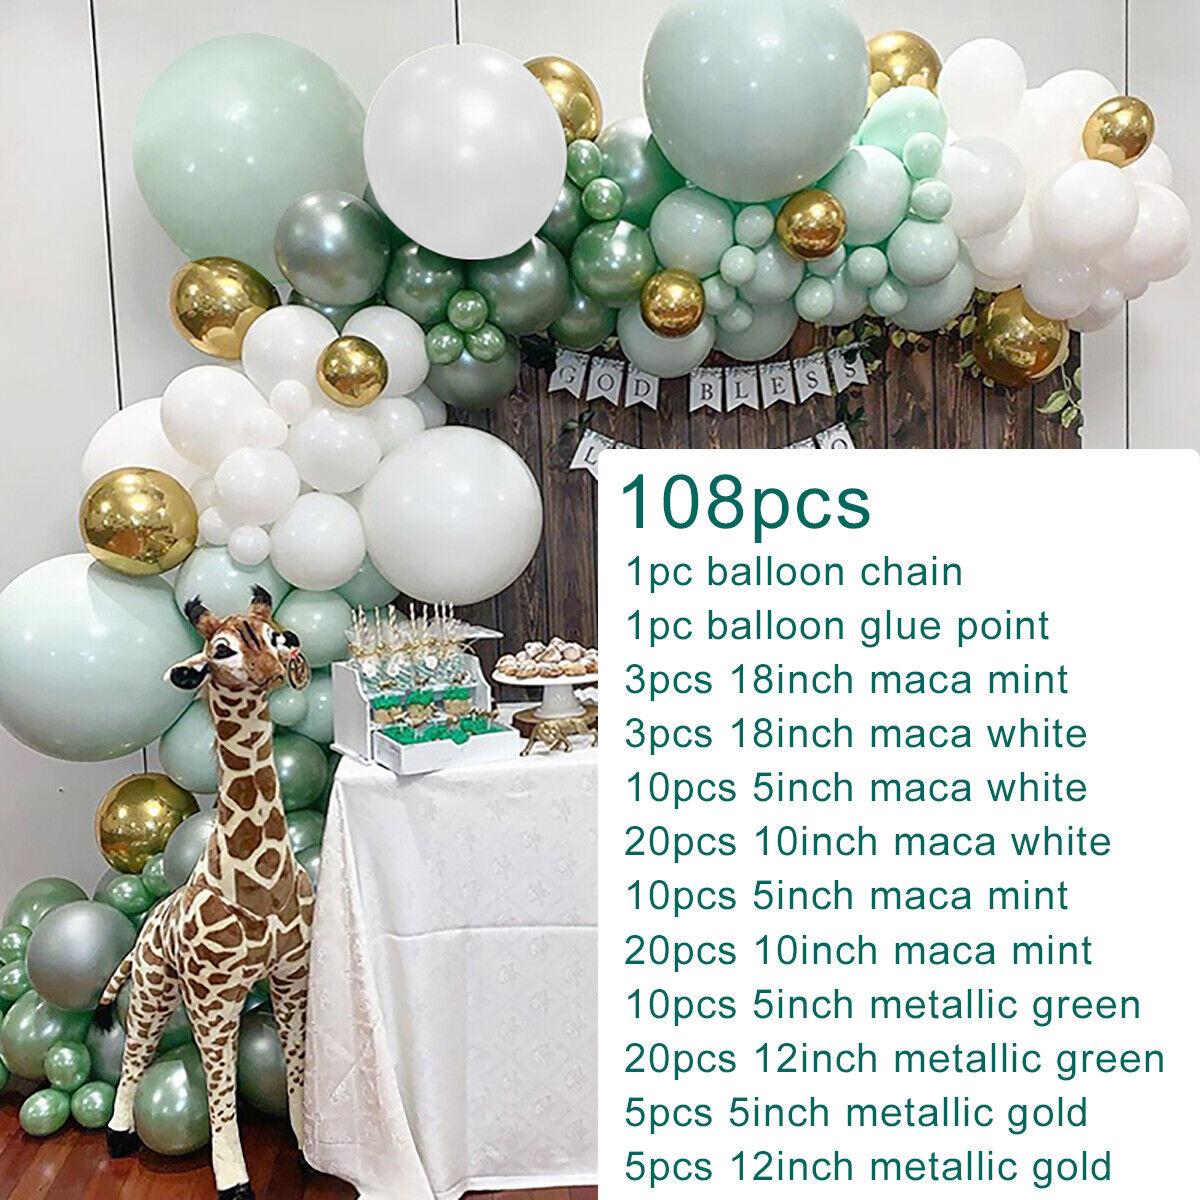 108pcs Macaron Pastel Balloon Garland Arch Kit Wedding Baby Shower Party Decor Ebay